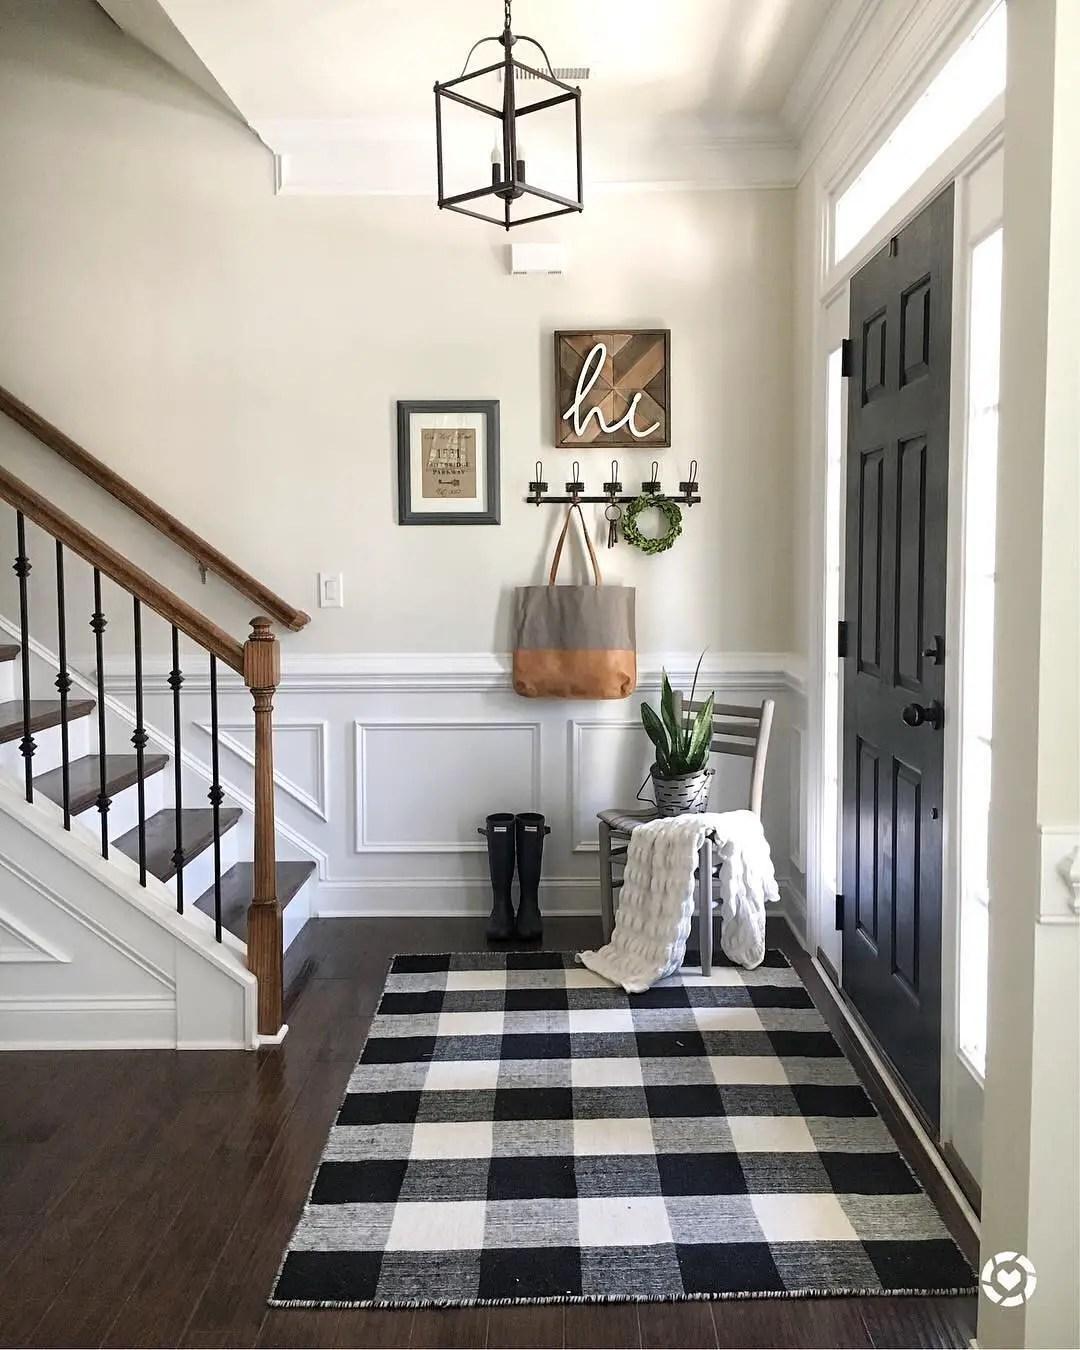 Buffalo Check Black White Year Round Home Decor Ideas Trendy Home Hacks